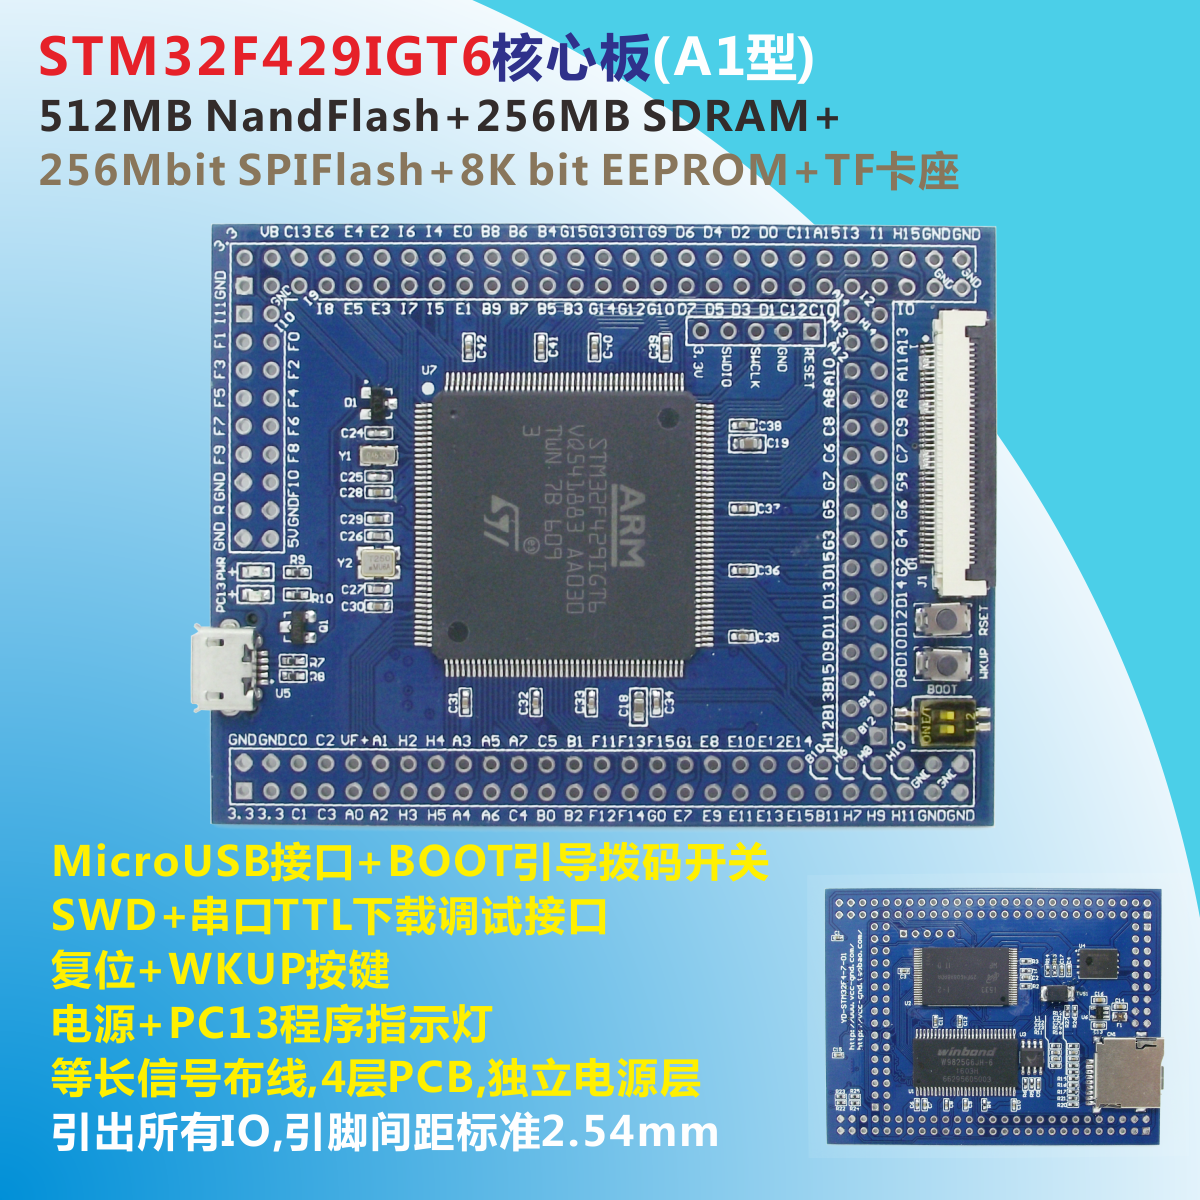 STM32F429IGT6 Core Board +NandFlash+SDRAM+SPIFlash+EEPROM (type A1) винтовка пневм gamo shadow igt